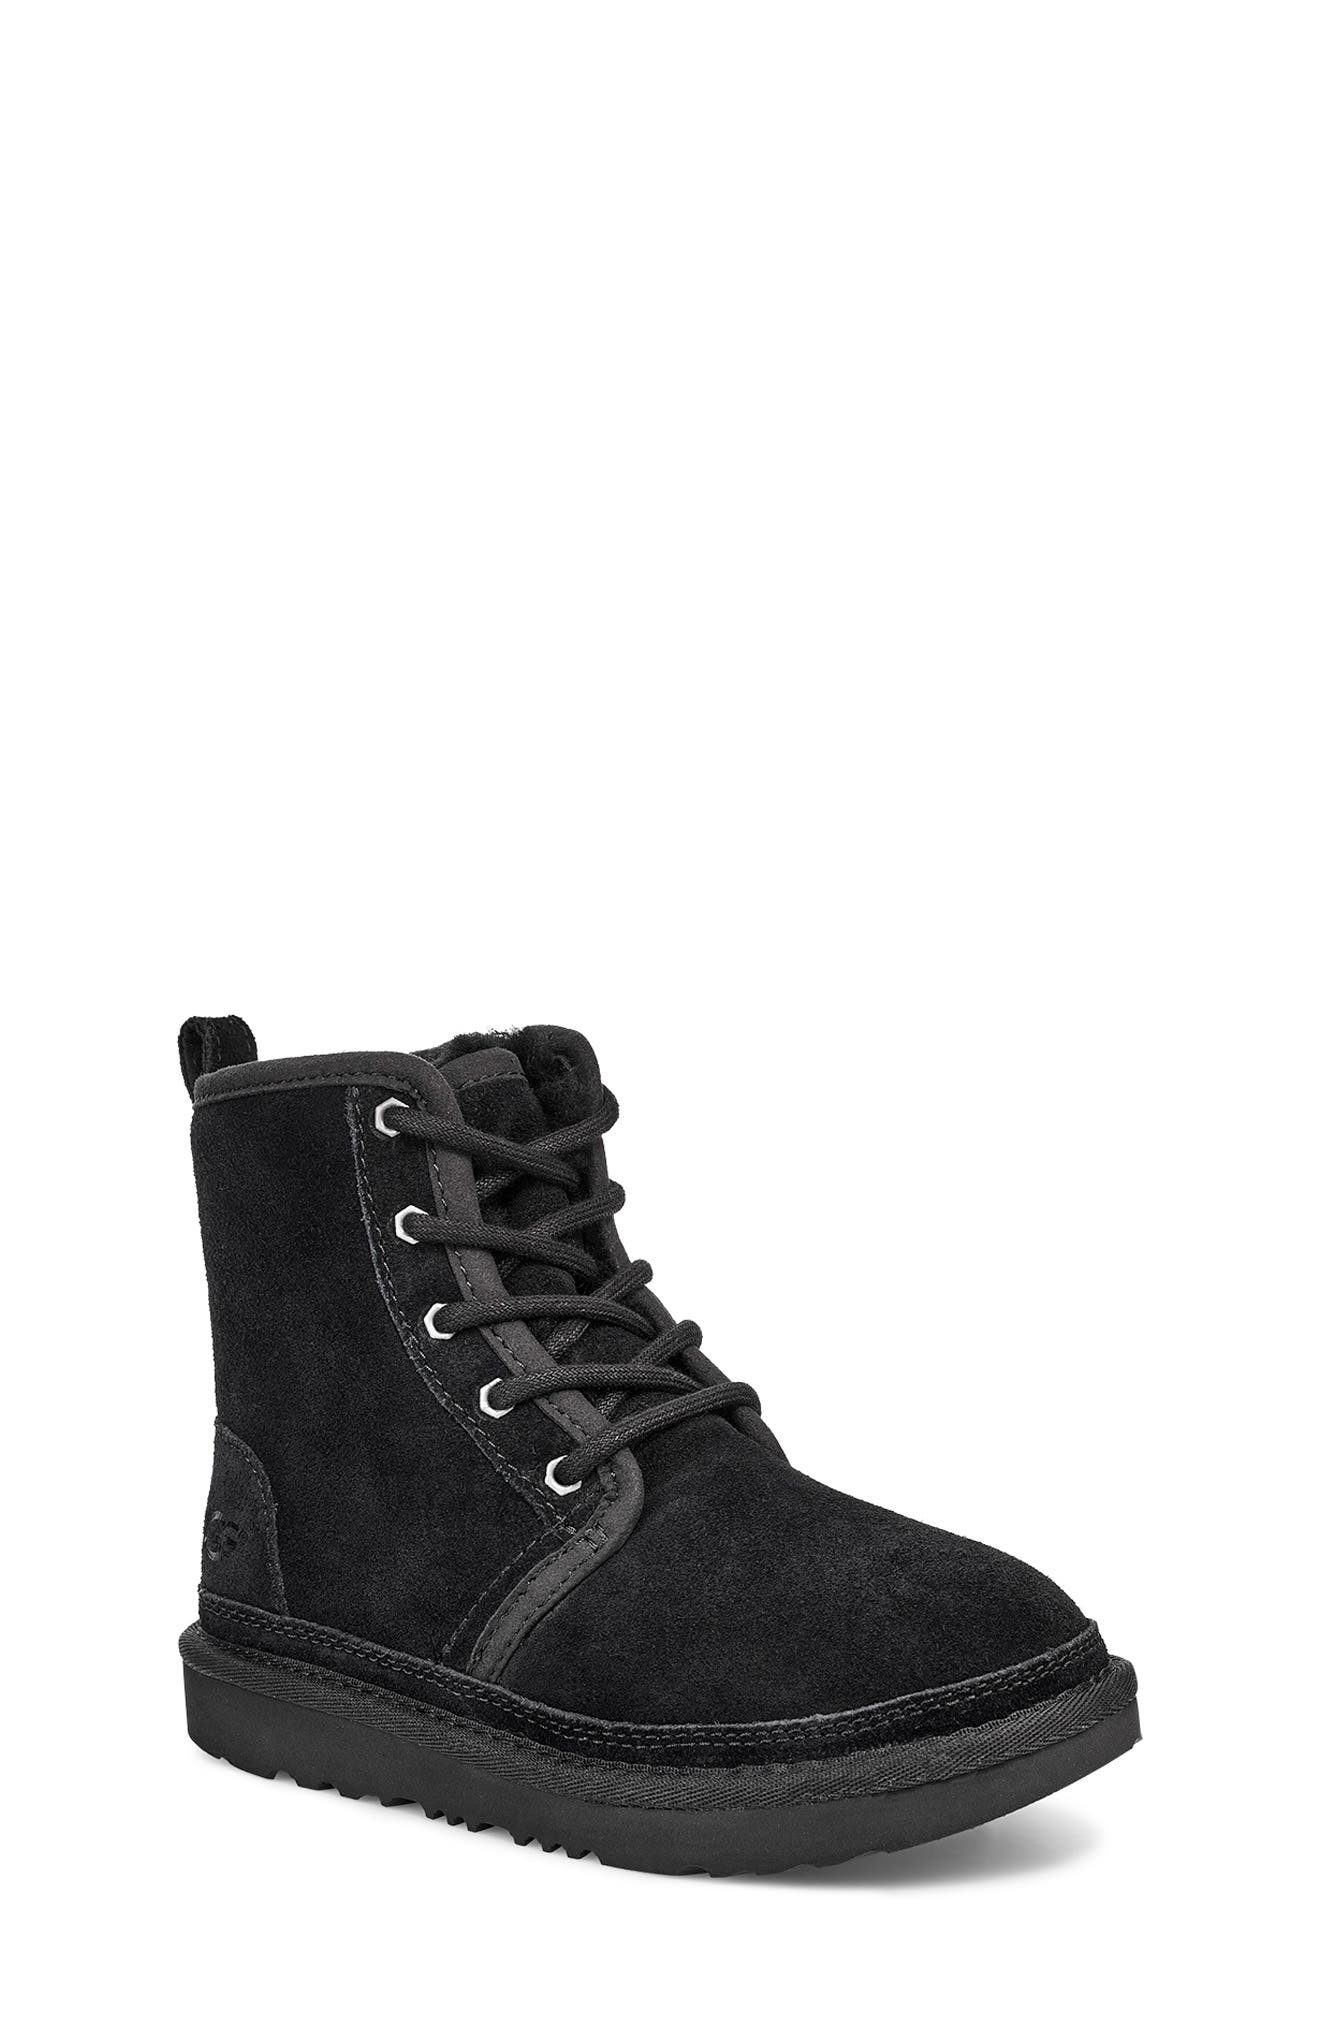 Boys Ugg Harkley LaceUp Boot Size 5 M  Black